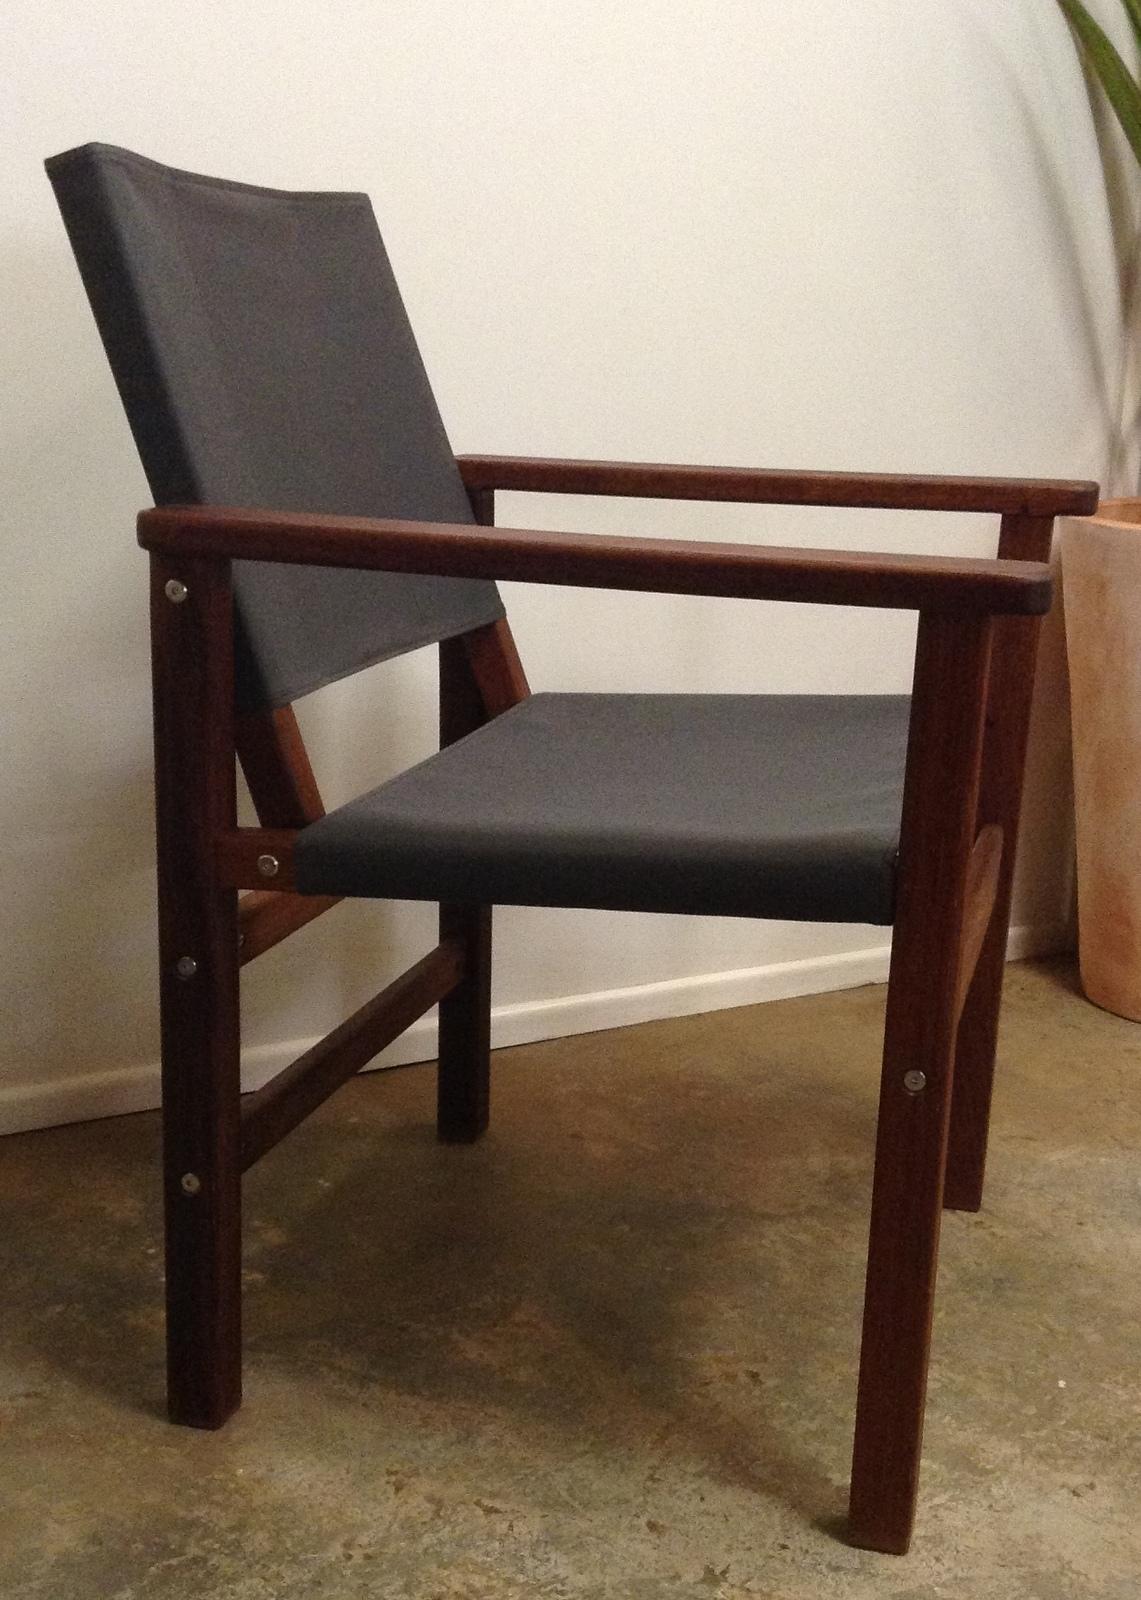 Sling Chair Cushions